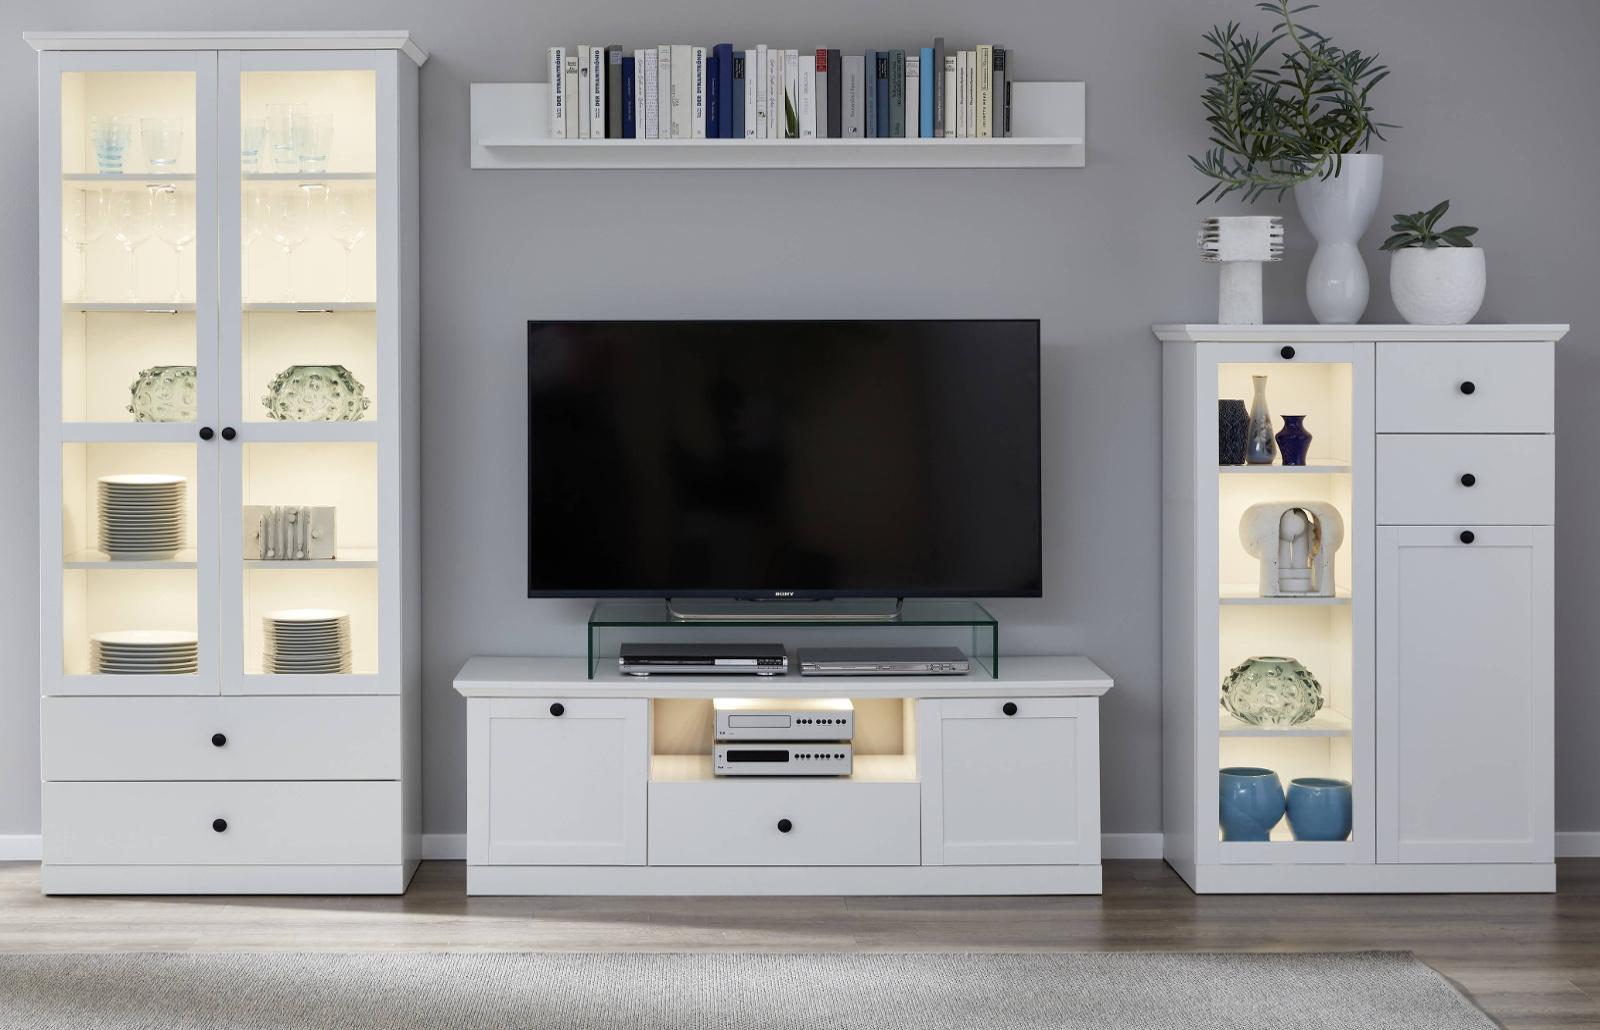 wohnwand baxter in wei 4 teilig. Black Bedroom Furniture Sets. Home Design Ideas